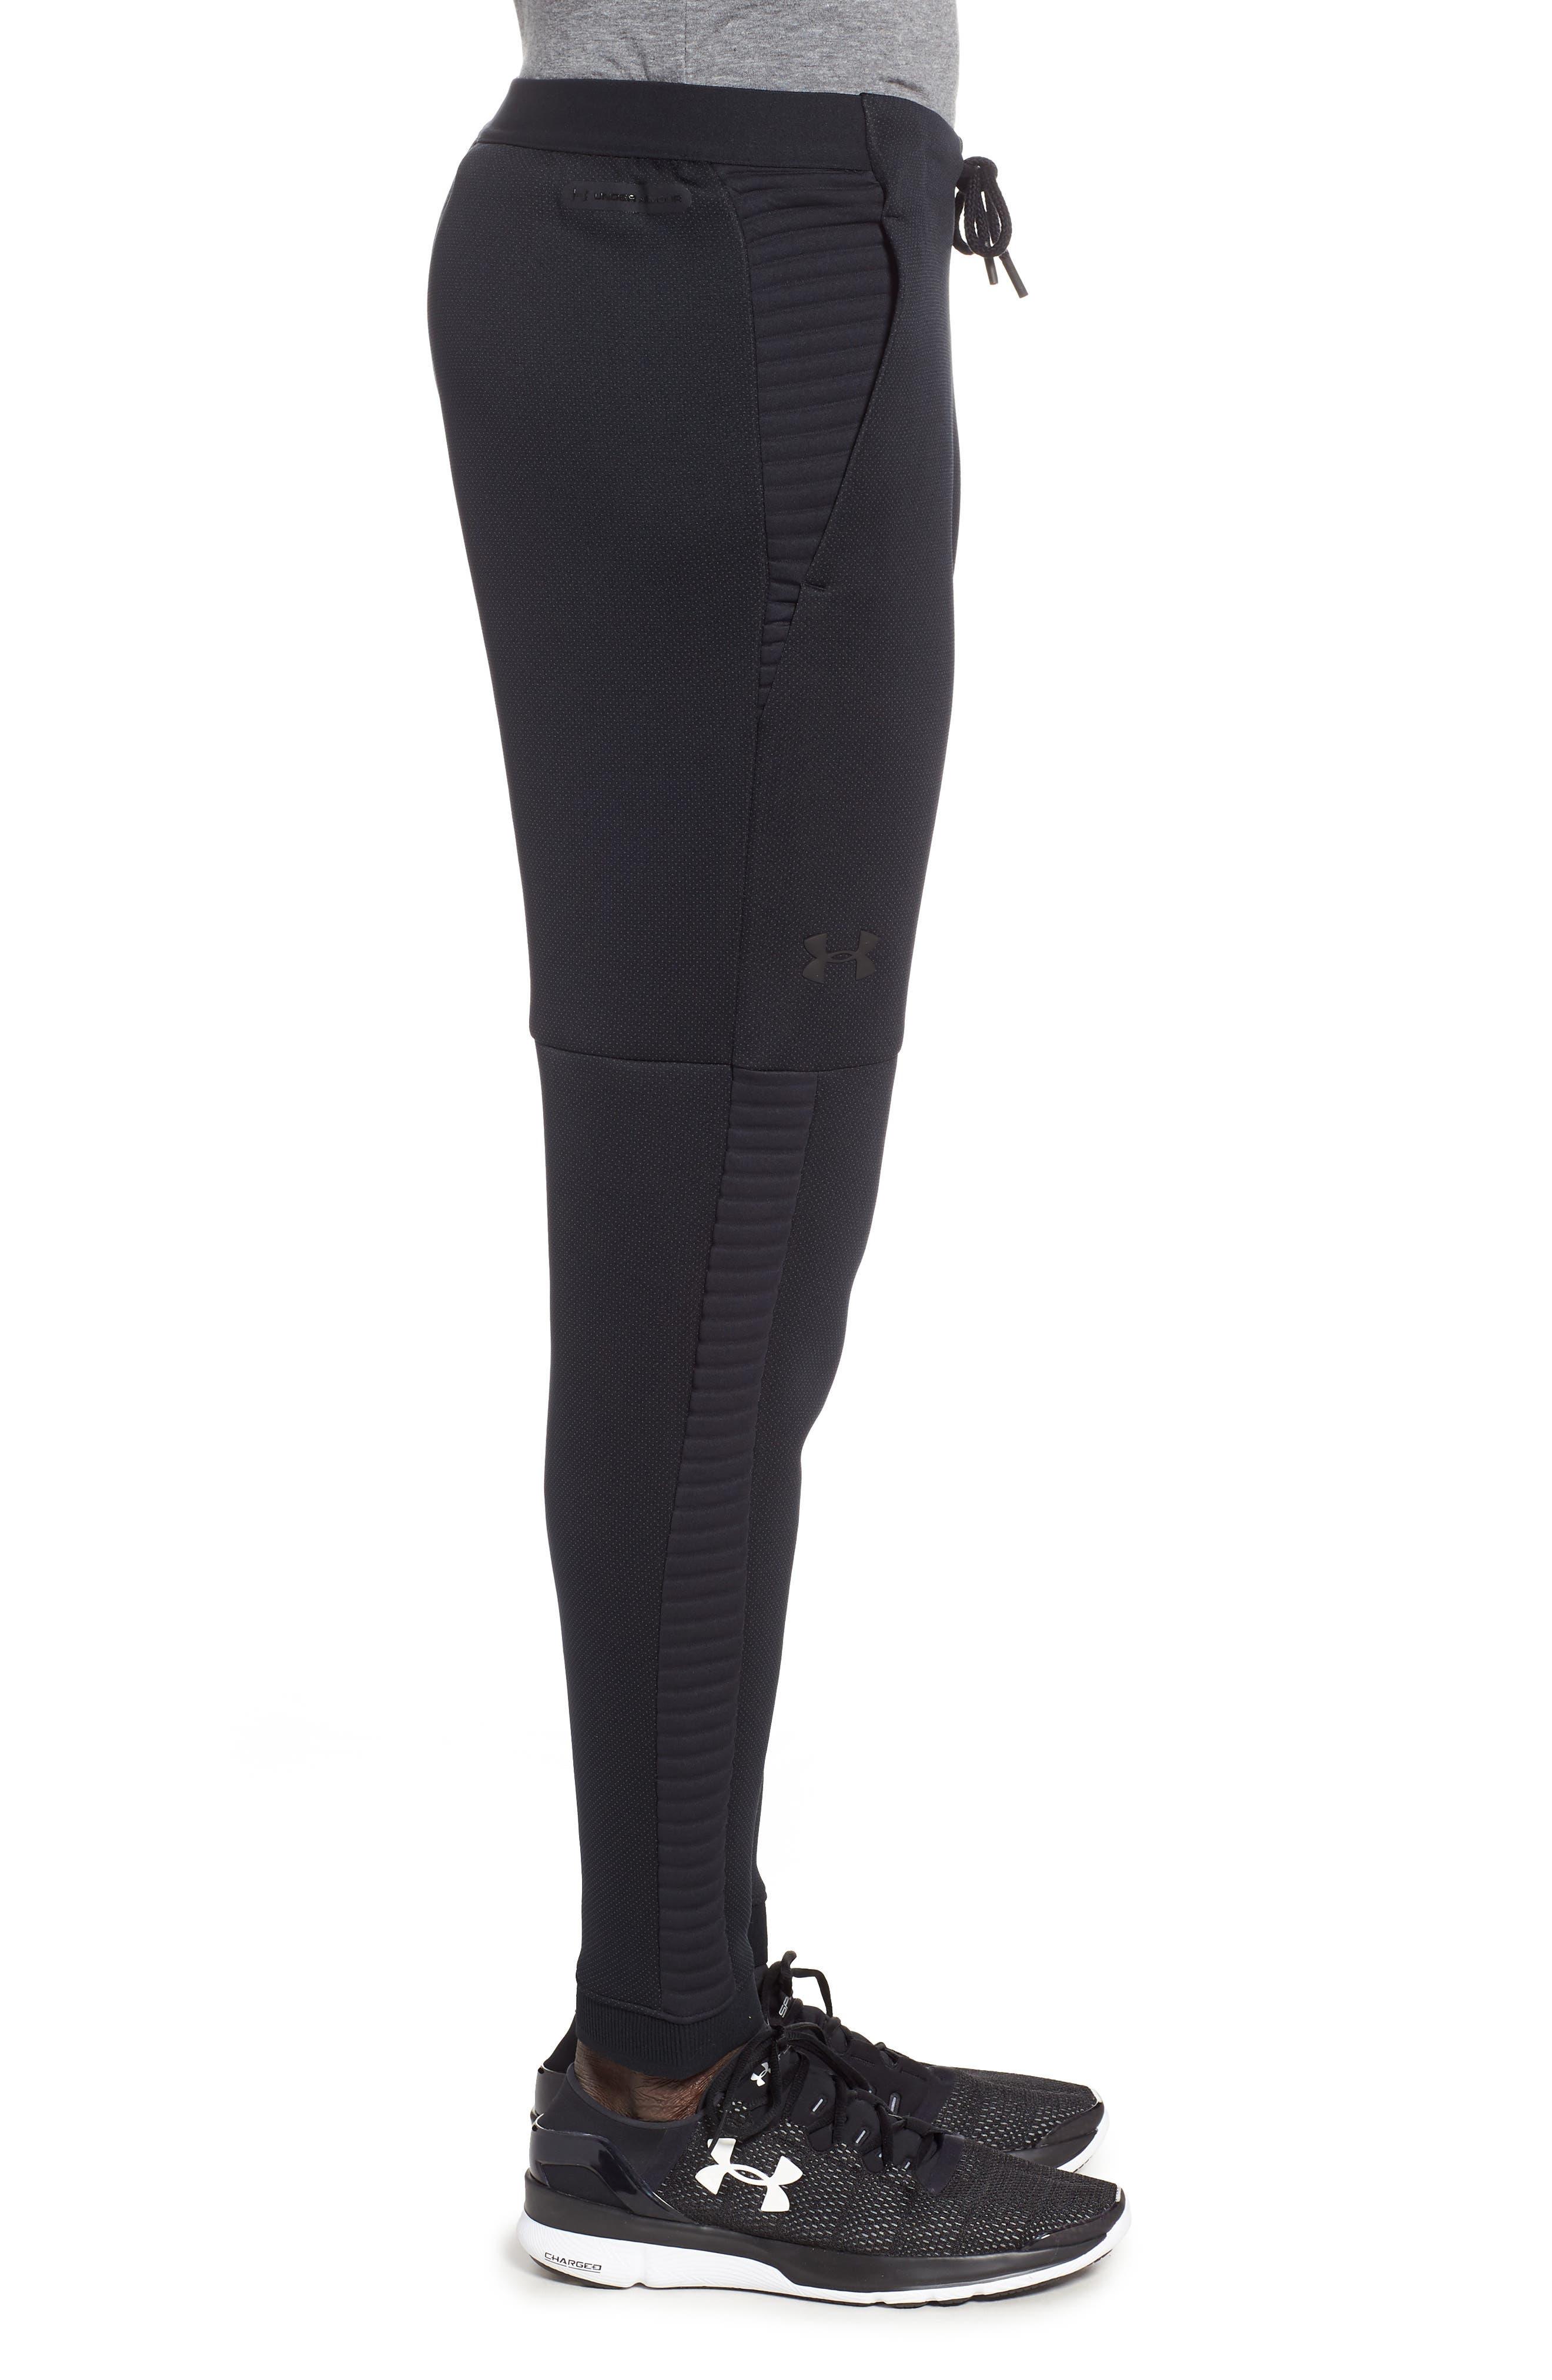 Unstoppable Move Airgap Pants,                             Alternate thumbnail 3, color,                             BLACK/ CHARCOAL/ BLACK